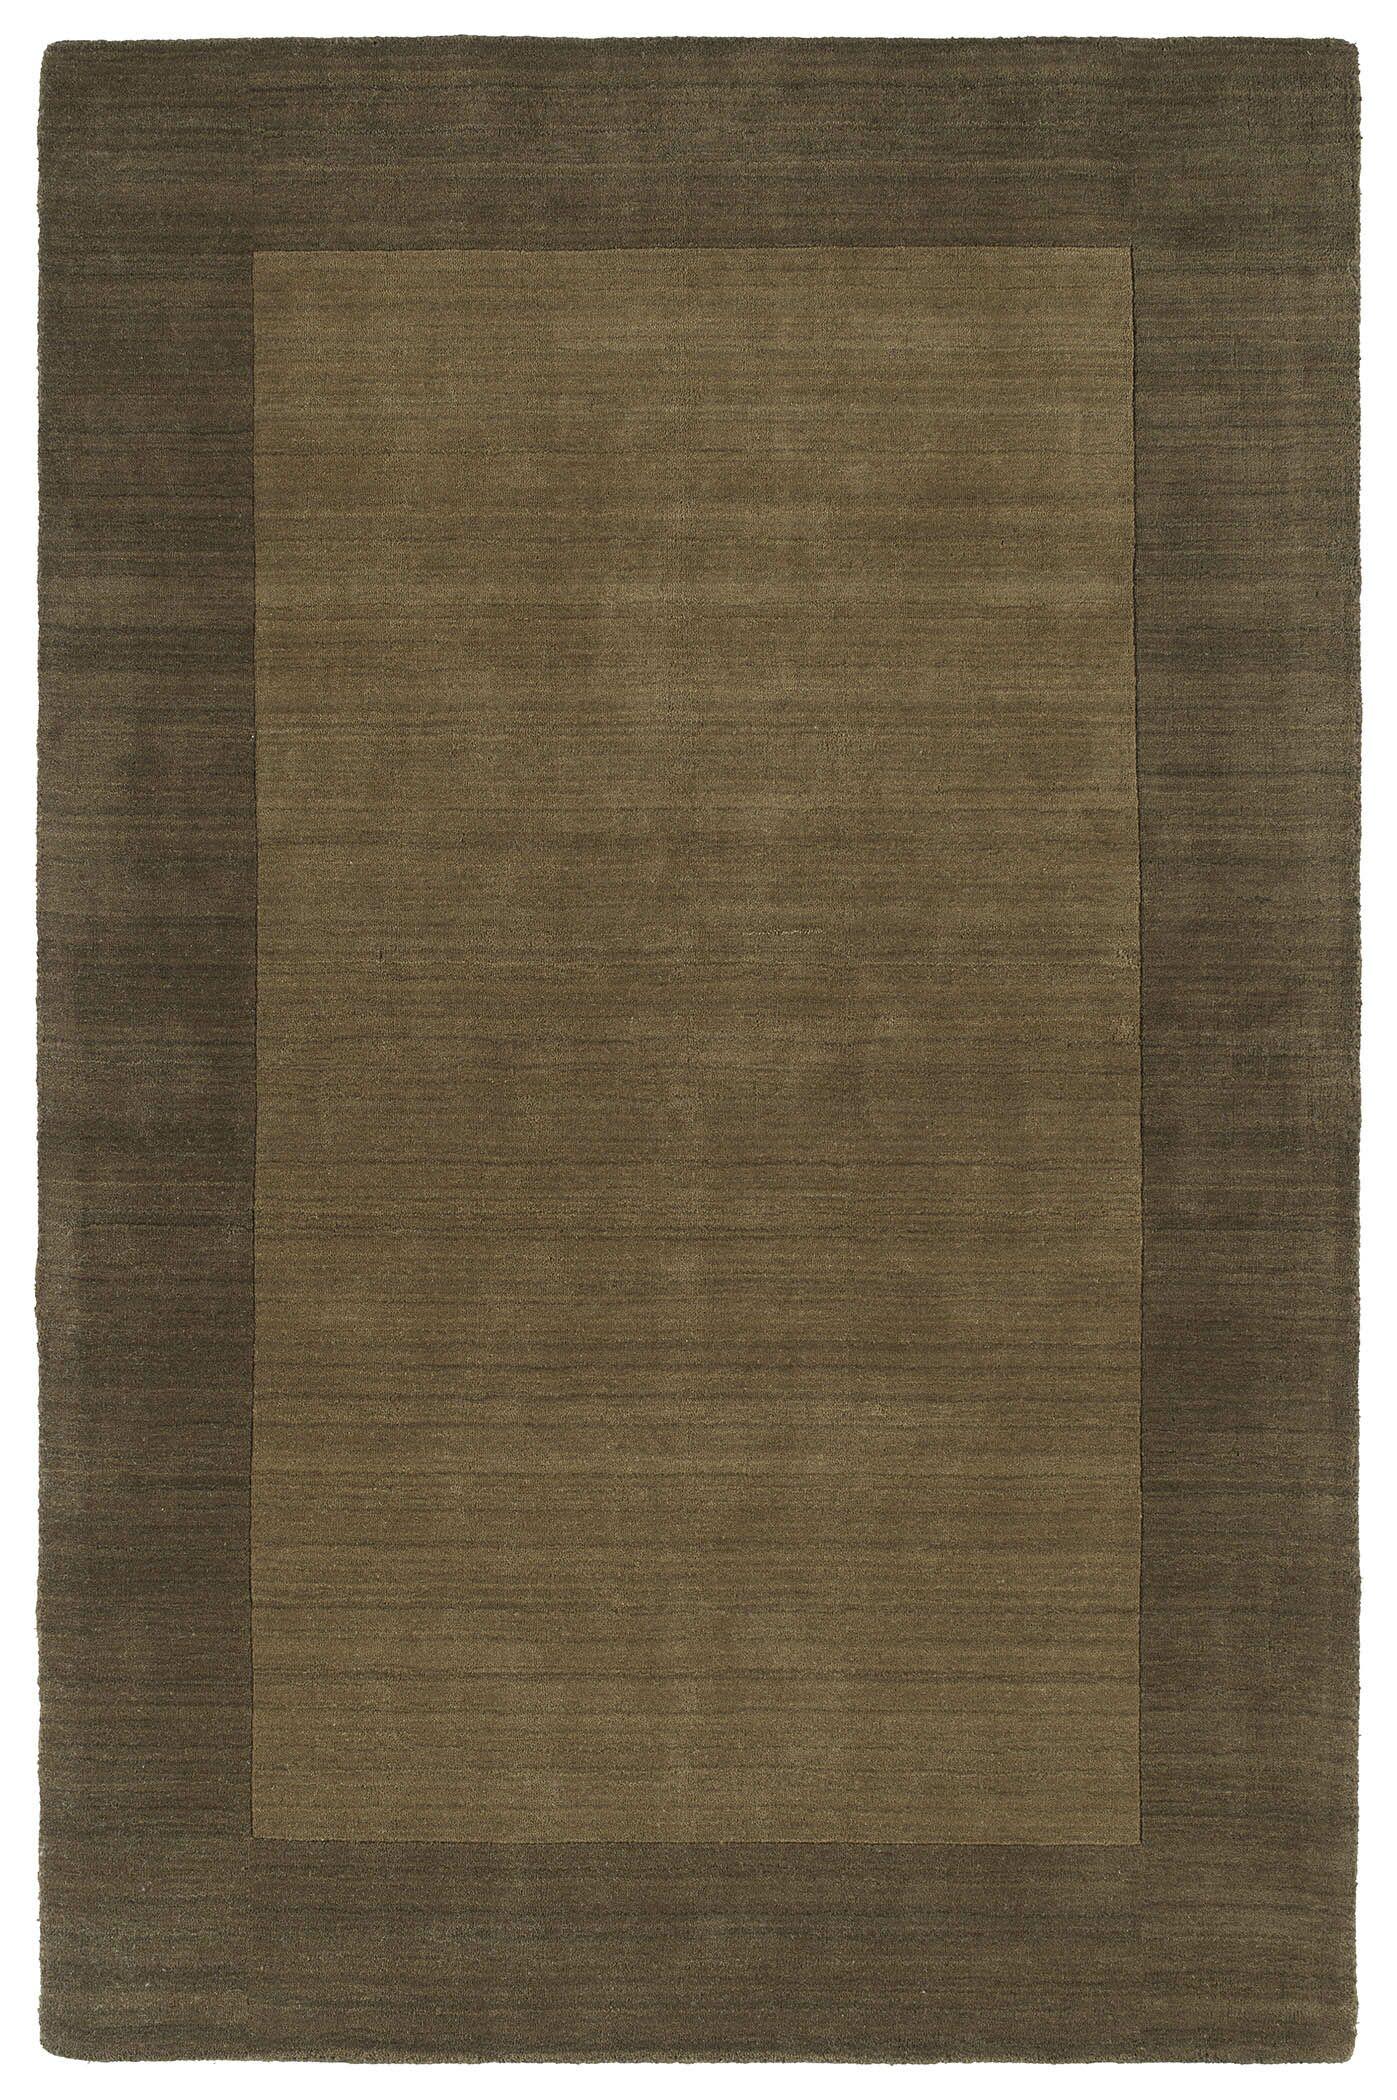 Barnard Chocolate Area Rug Rug Size: Rectangle 5' x 7'9